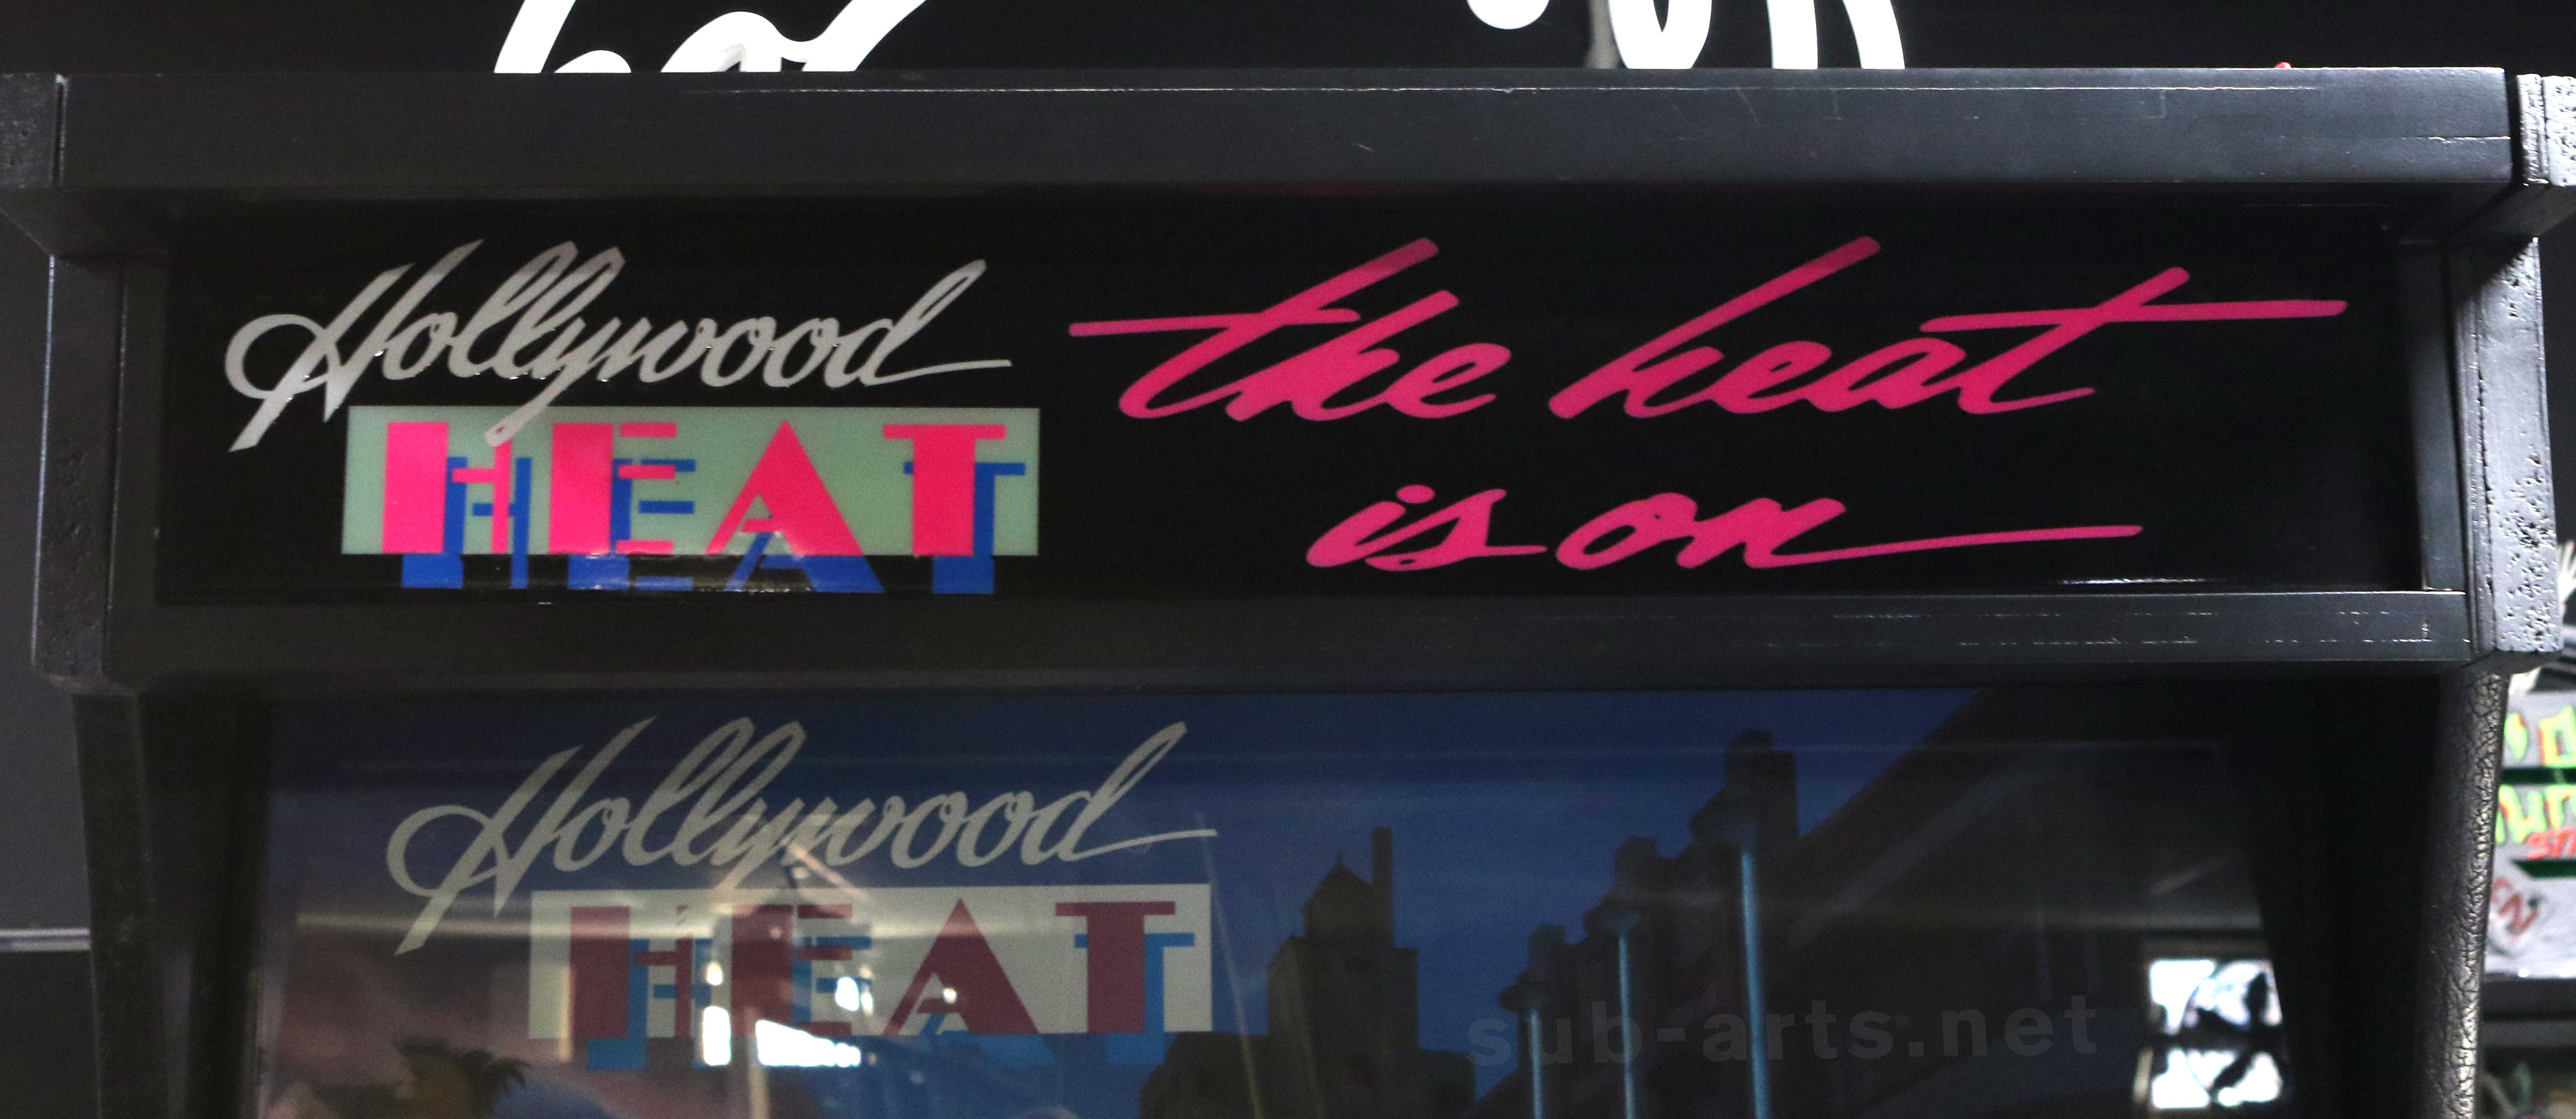 hollywood-heat-pinball-custom-topper-nouv